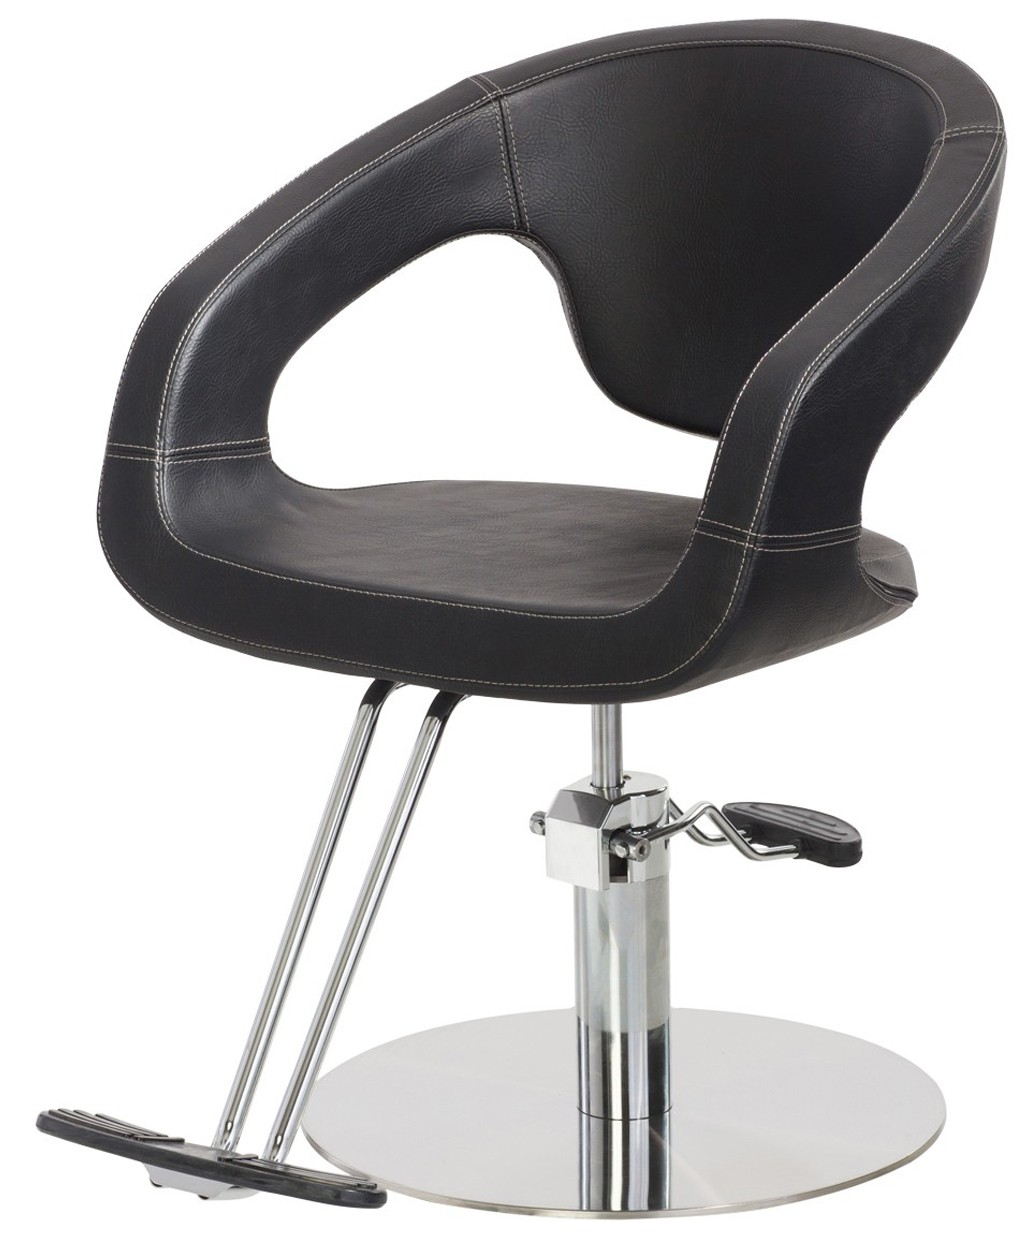 4 Operator Zena & Miami Salon Package Zena Styling Chair